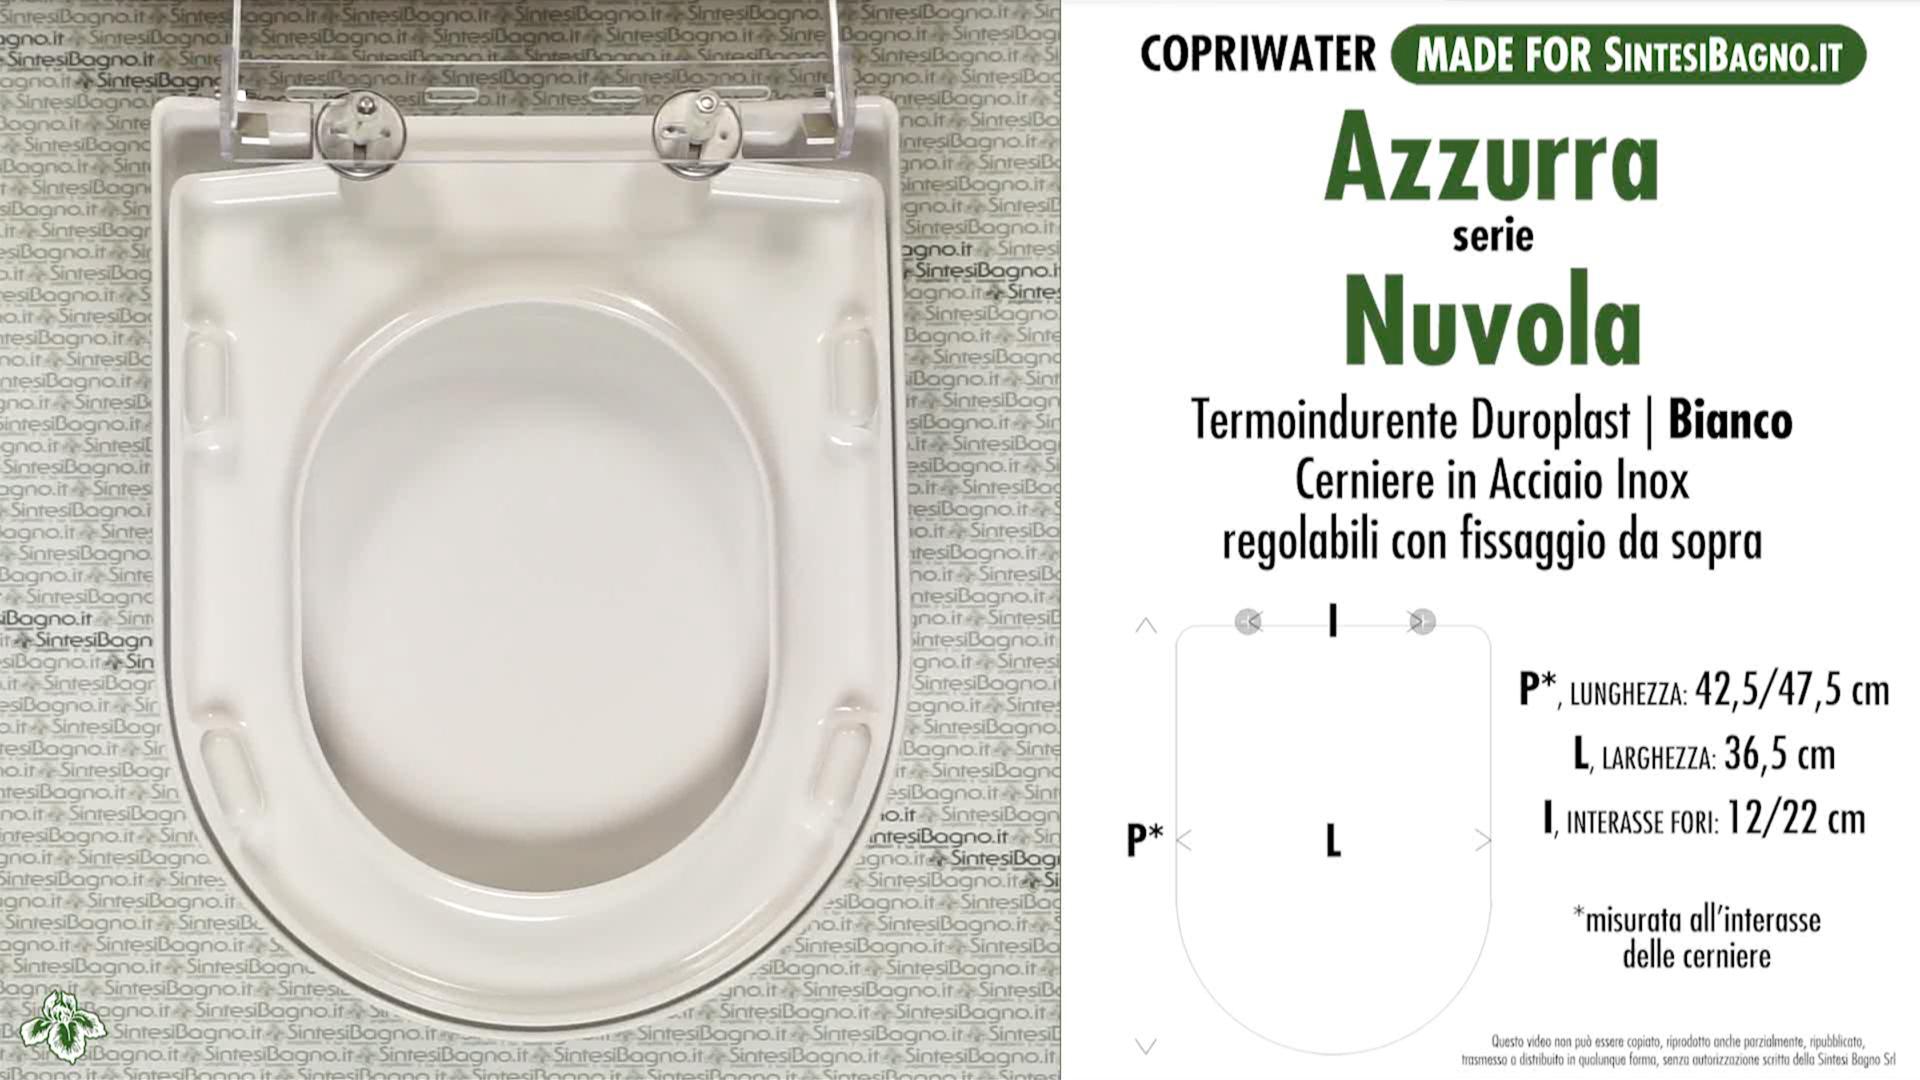 SCHEDA TECNICA MISURE copriwater AZZURRA NUVOLA